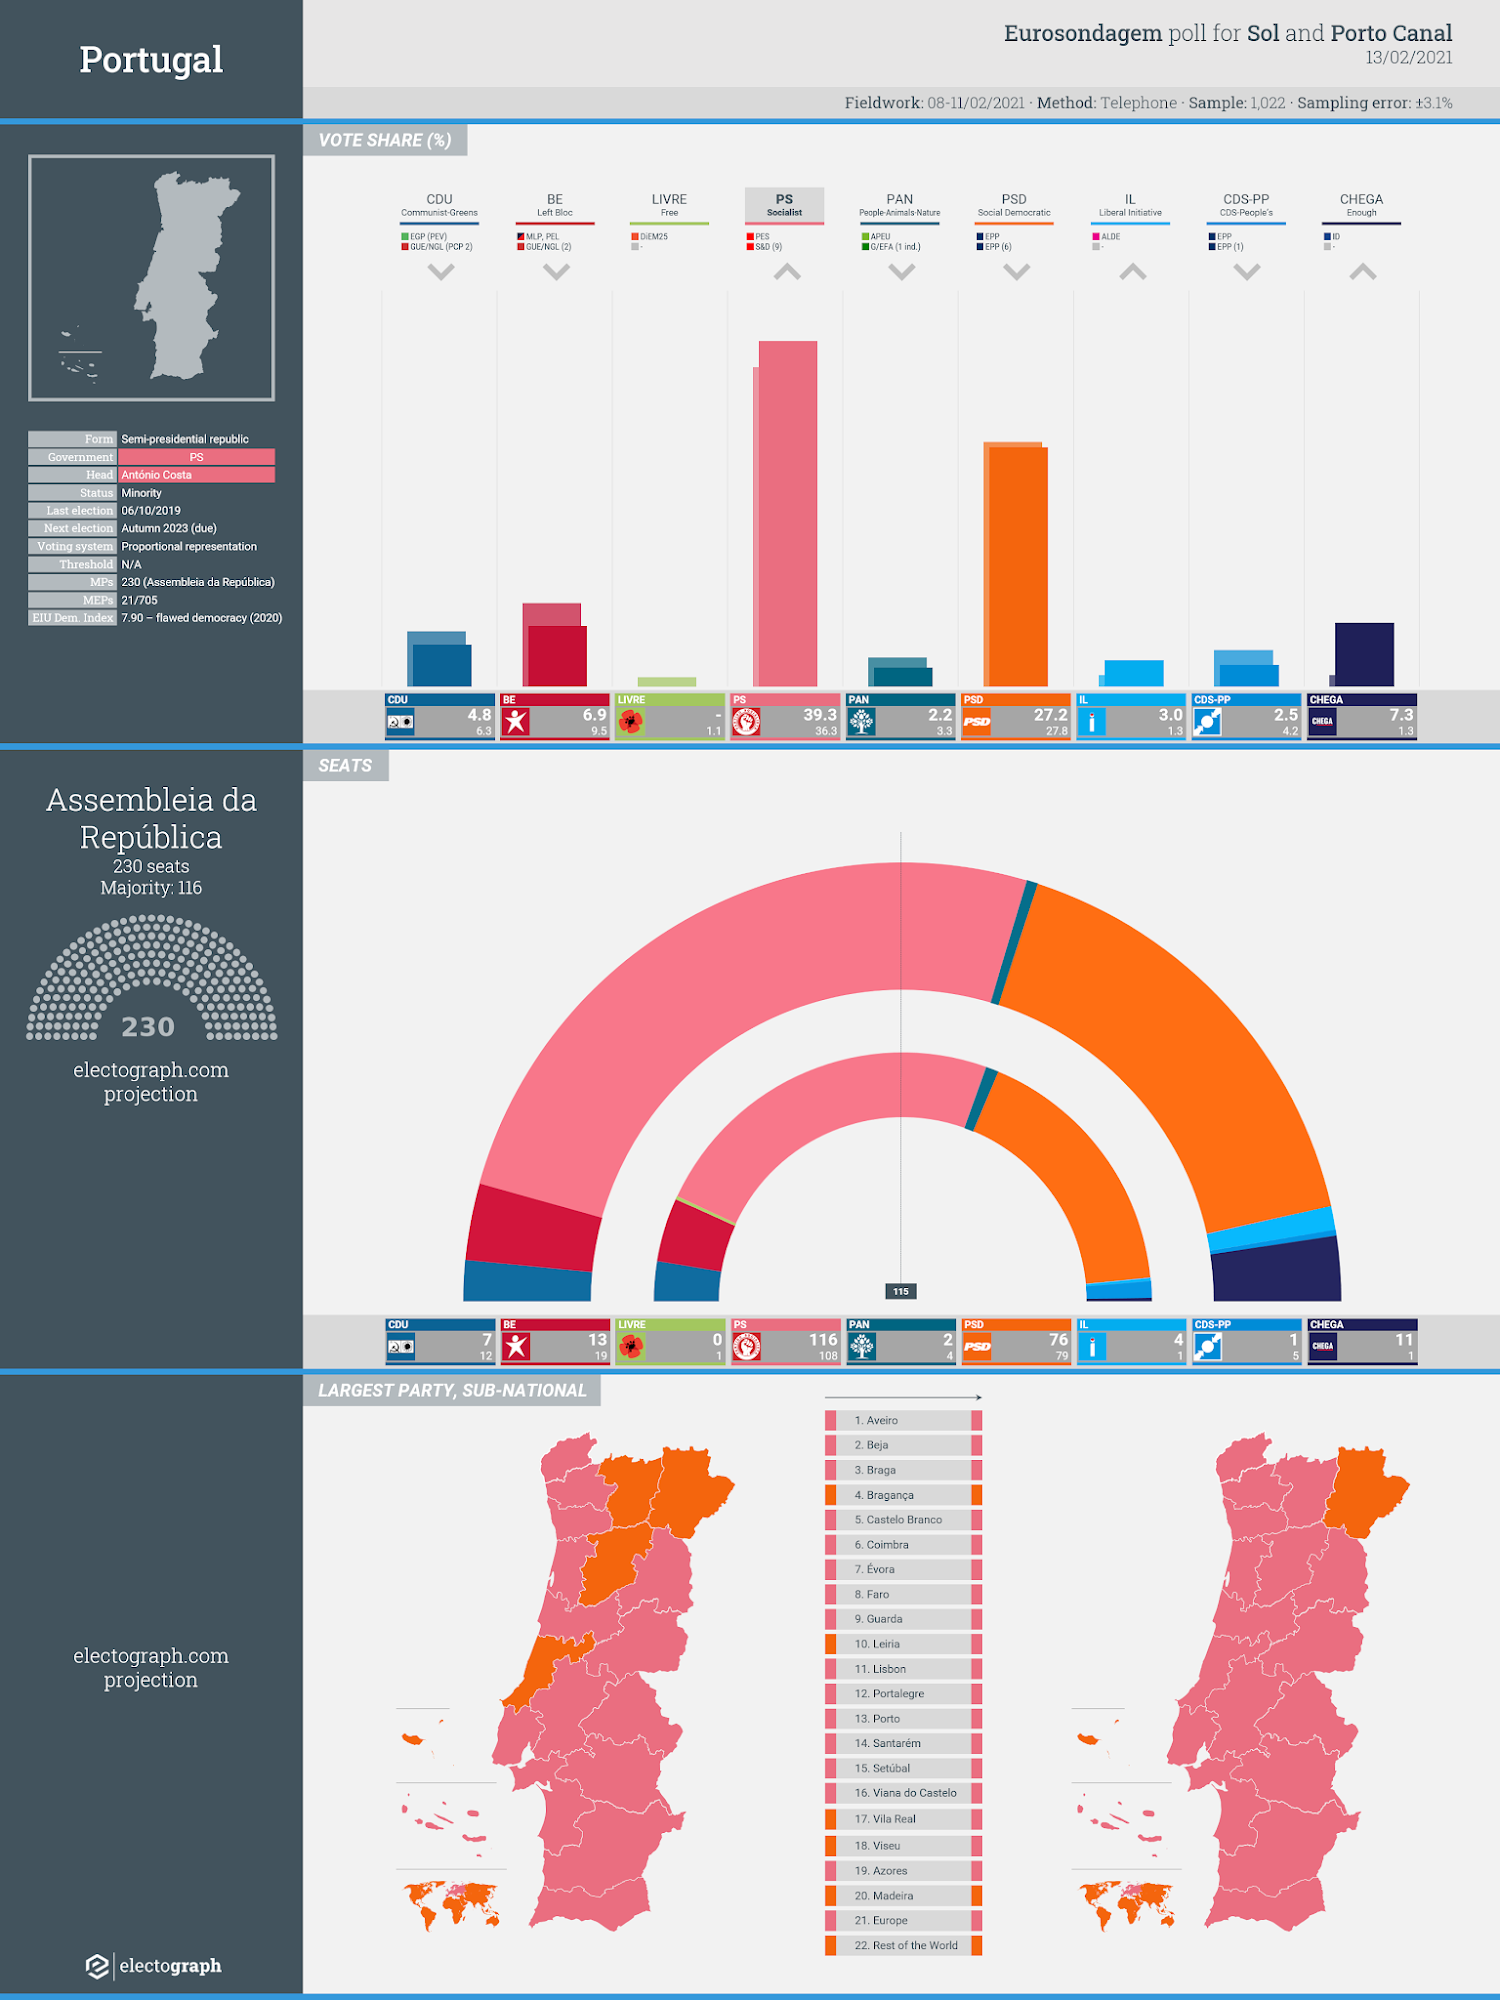 PORTUGAL: Eurosondagem poll chart for Sol and Porto Canal, 13 February 2021